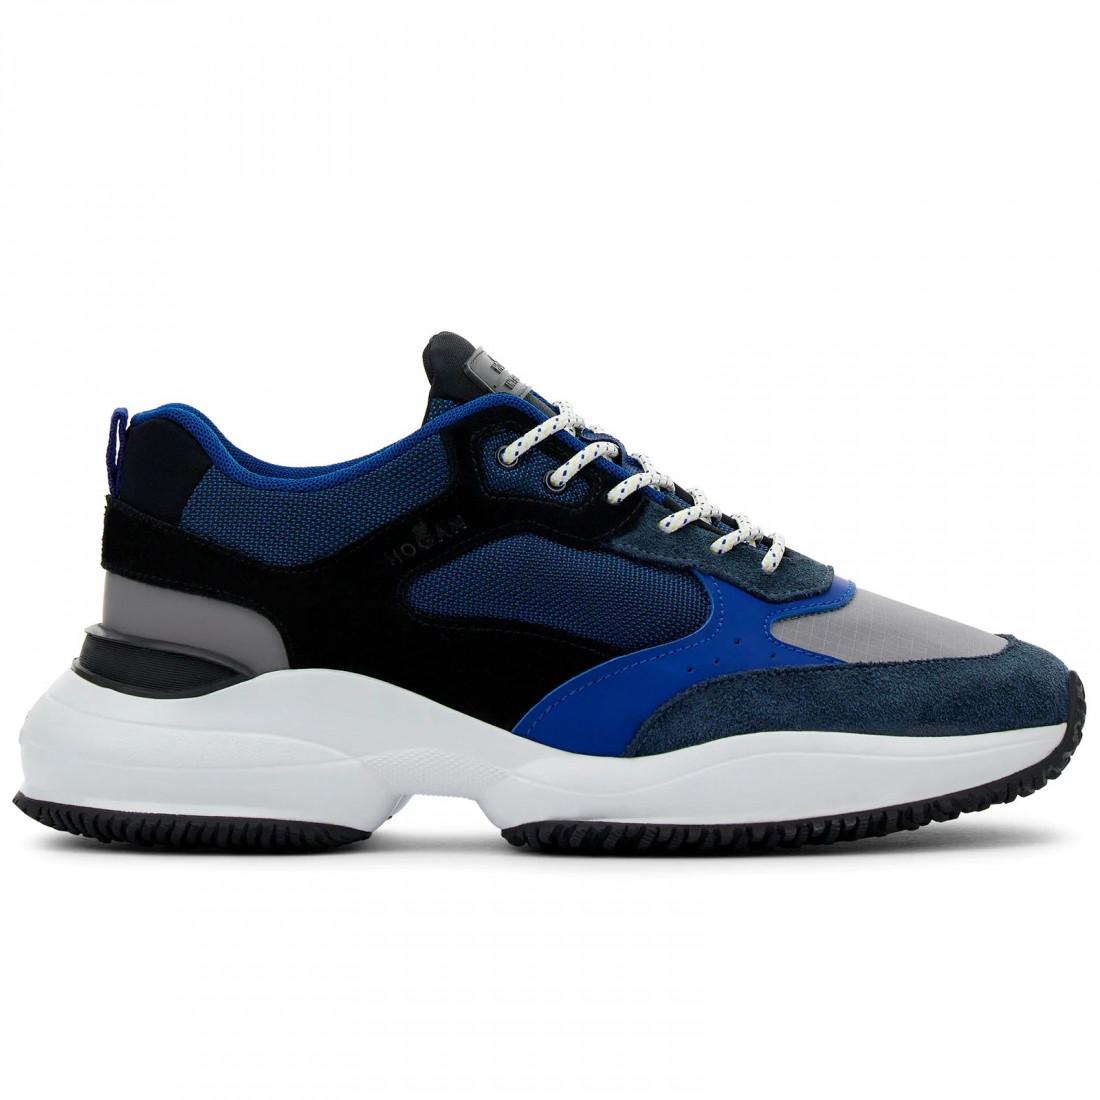 sneakers uomo hogan hxm5450dh10pfg841p 8175